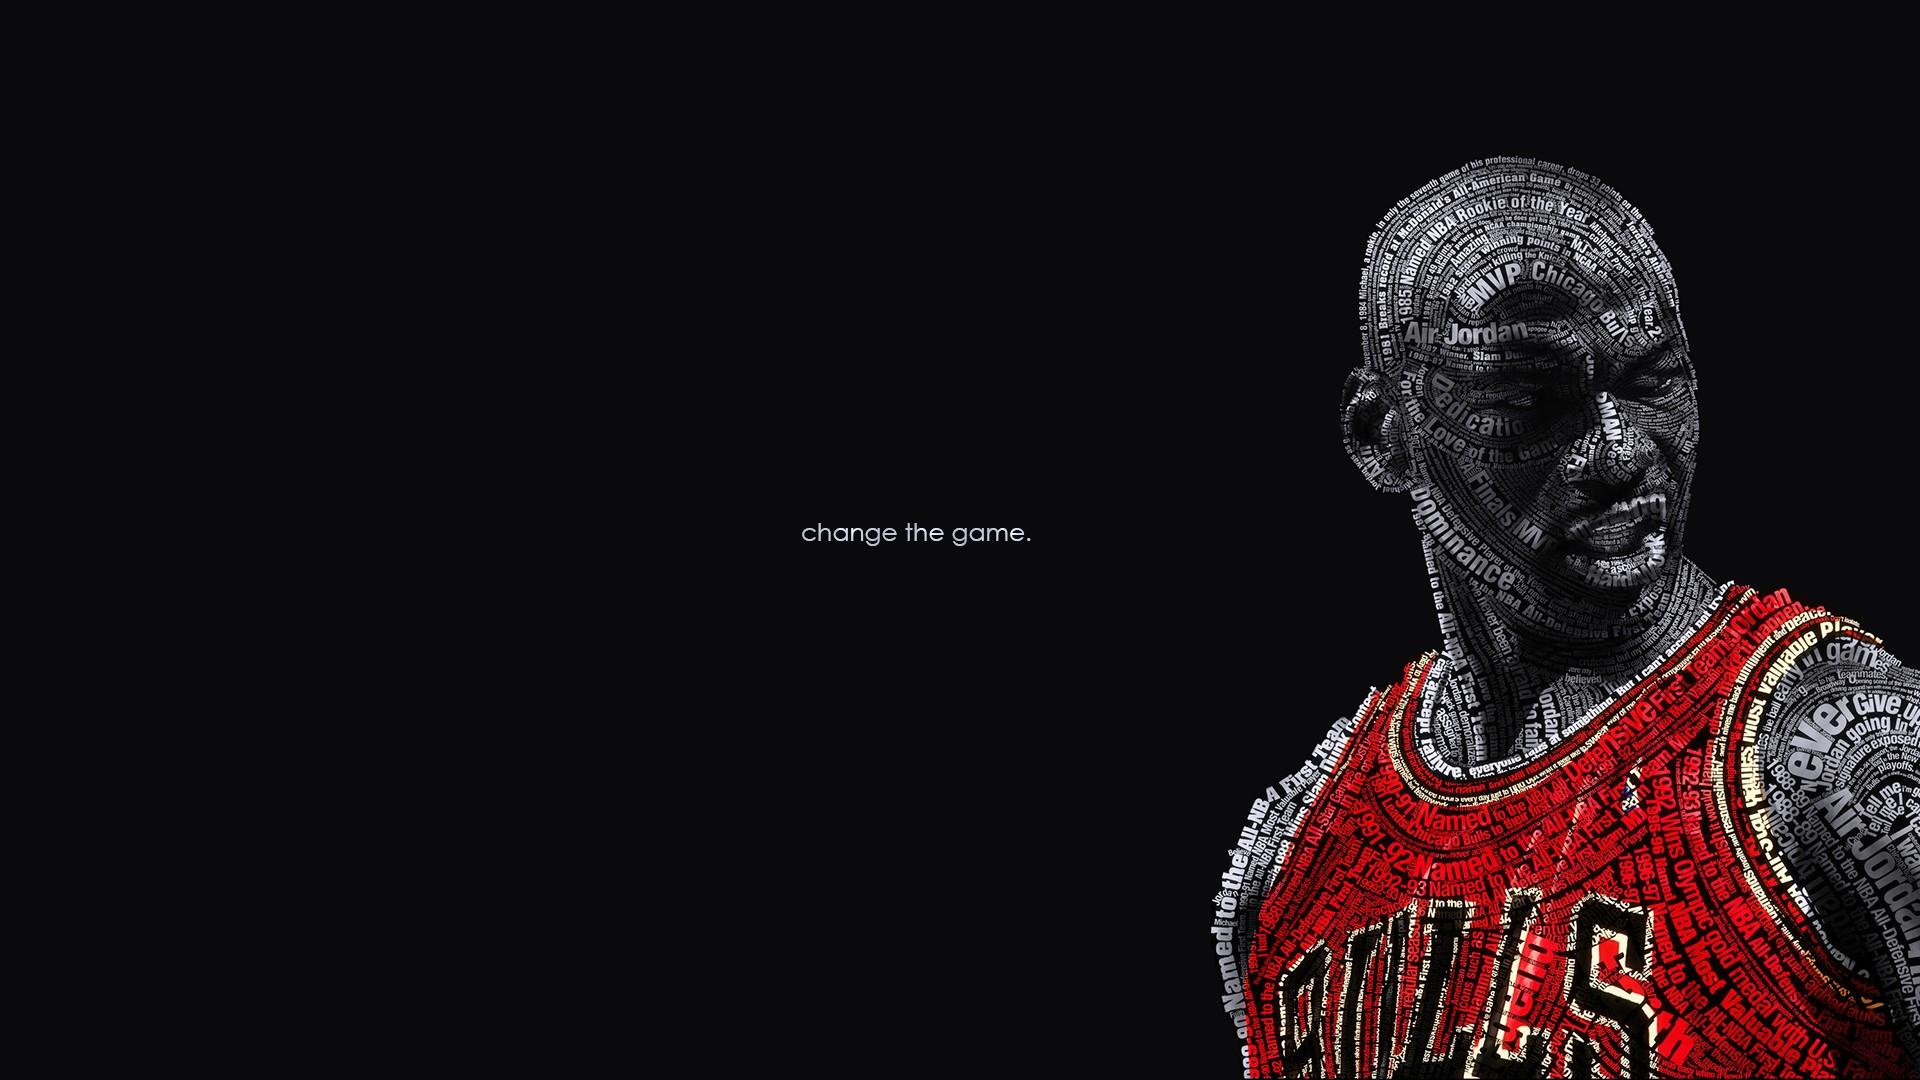 Michael Jordan Black Background - Michael Jordan Black Background